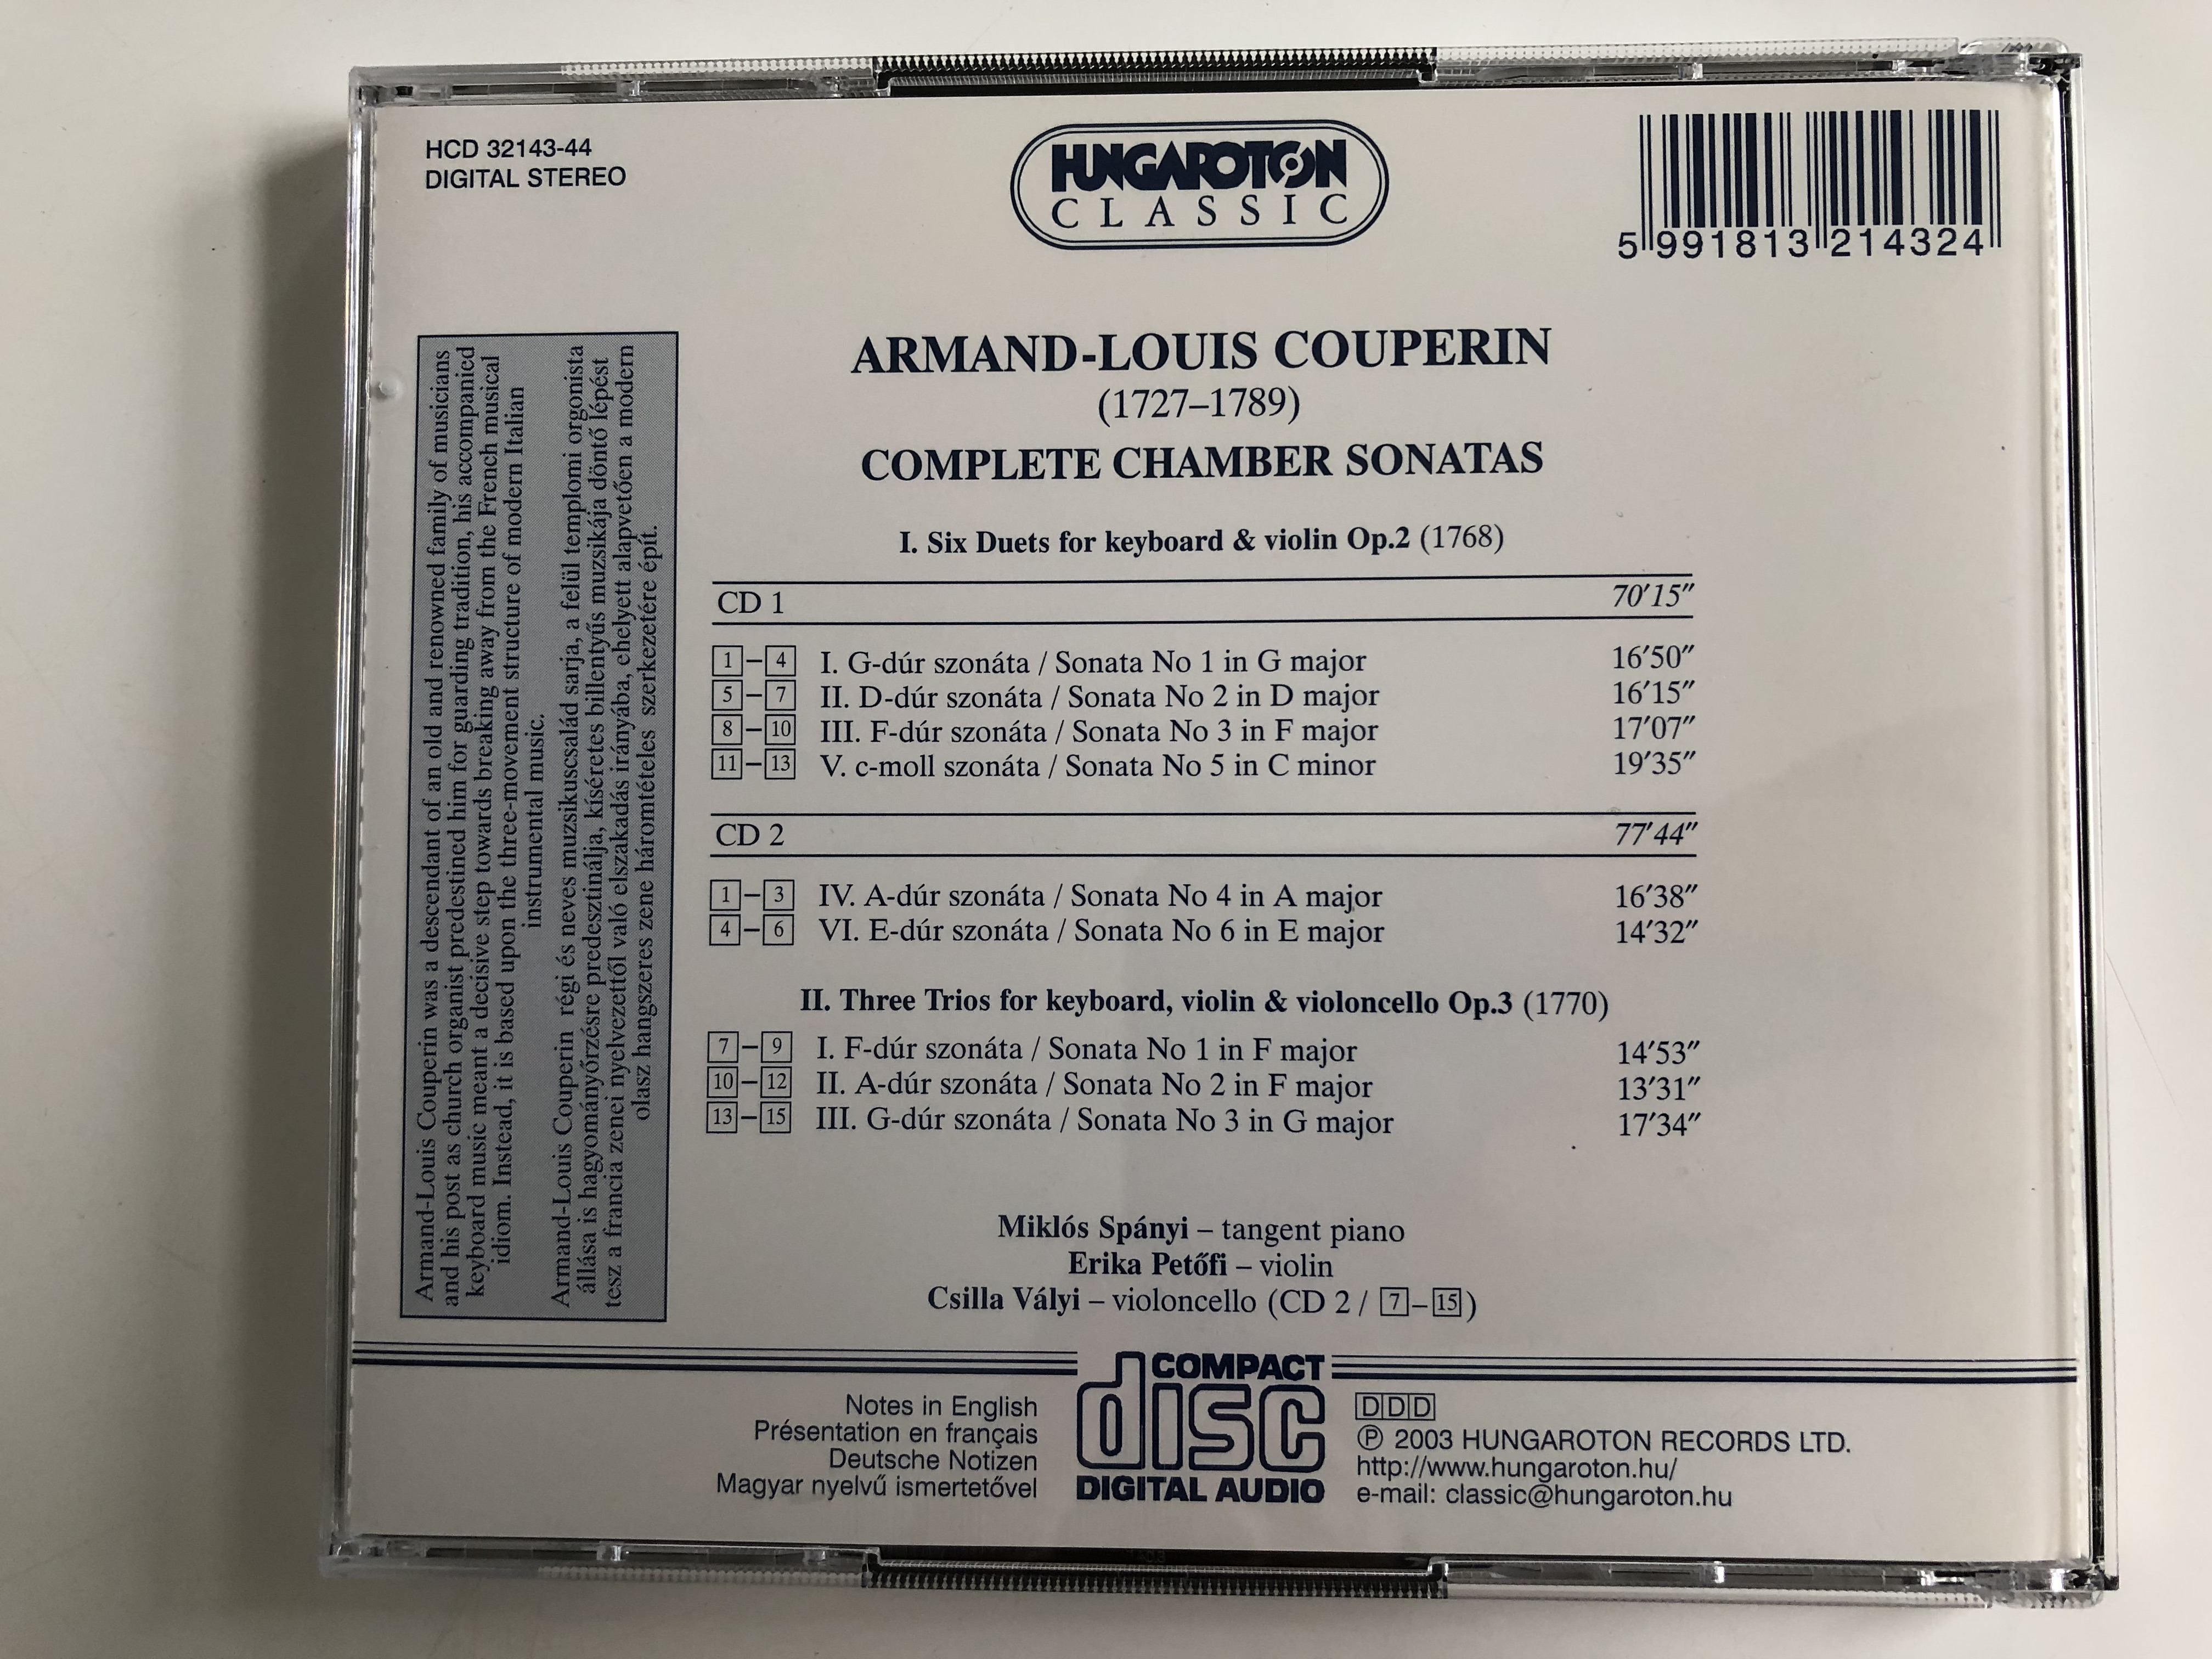 armand-louis-couperin-complete-chamber-sonatas-duets-and-trios-for-keyboard-instrument-violin-violoncello-tangent-piano-miklos-spanyi-violin-erika-petofi-violoncello-csilla-valyi-hung-8-.jpg